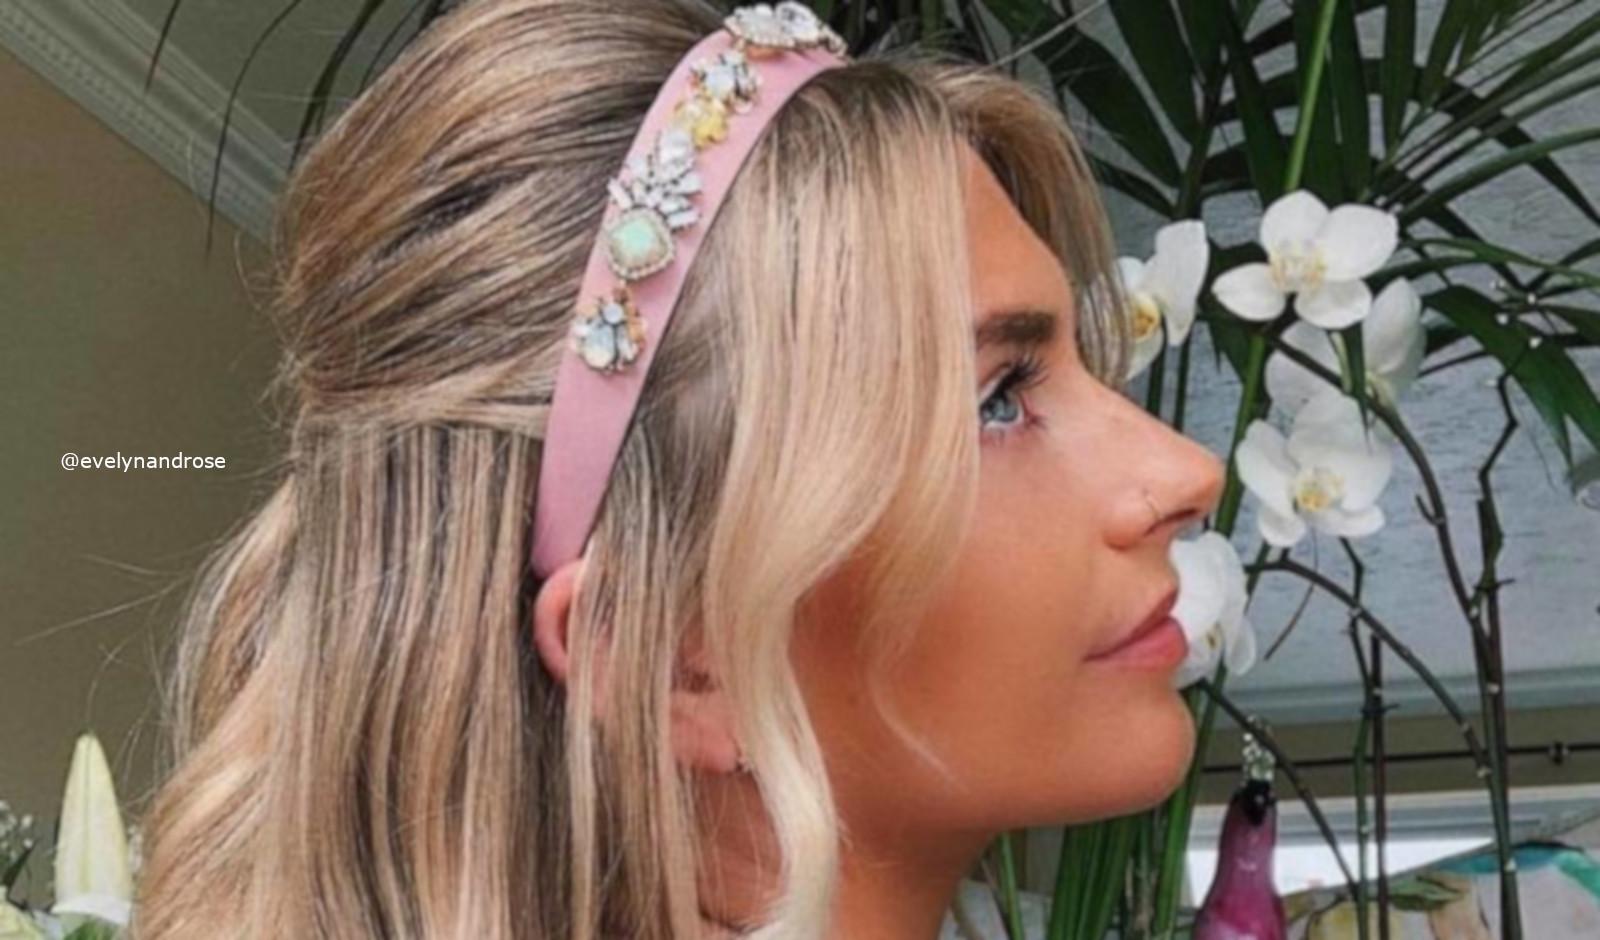 Insanely Pretty Headband Hairstyles To Copy Now